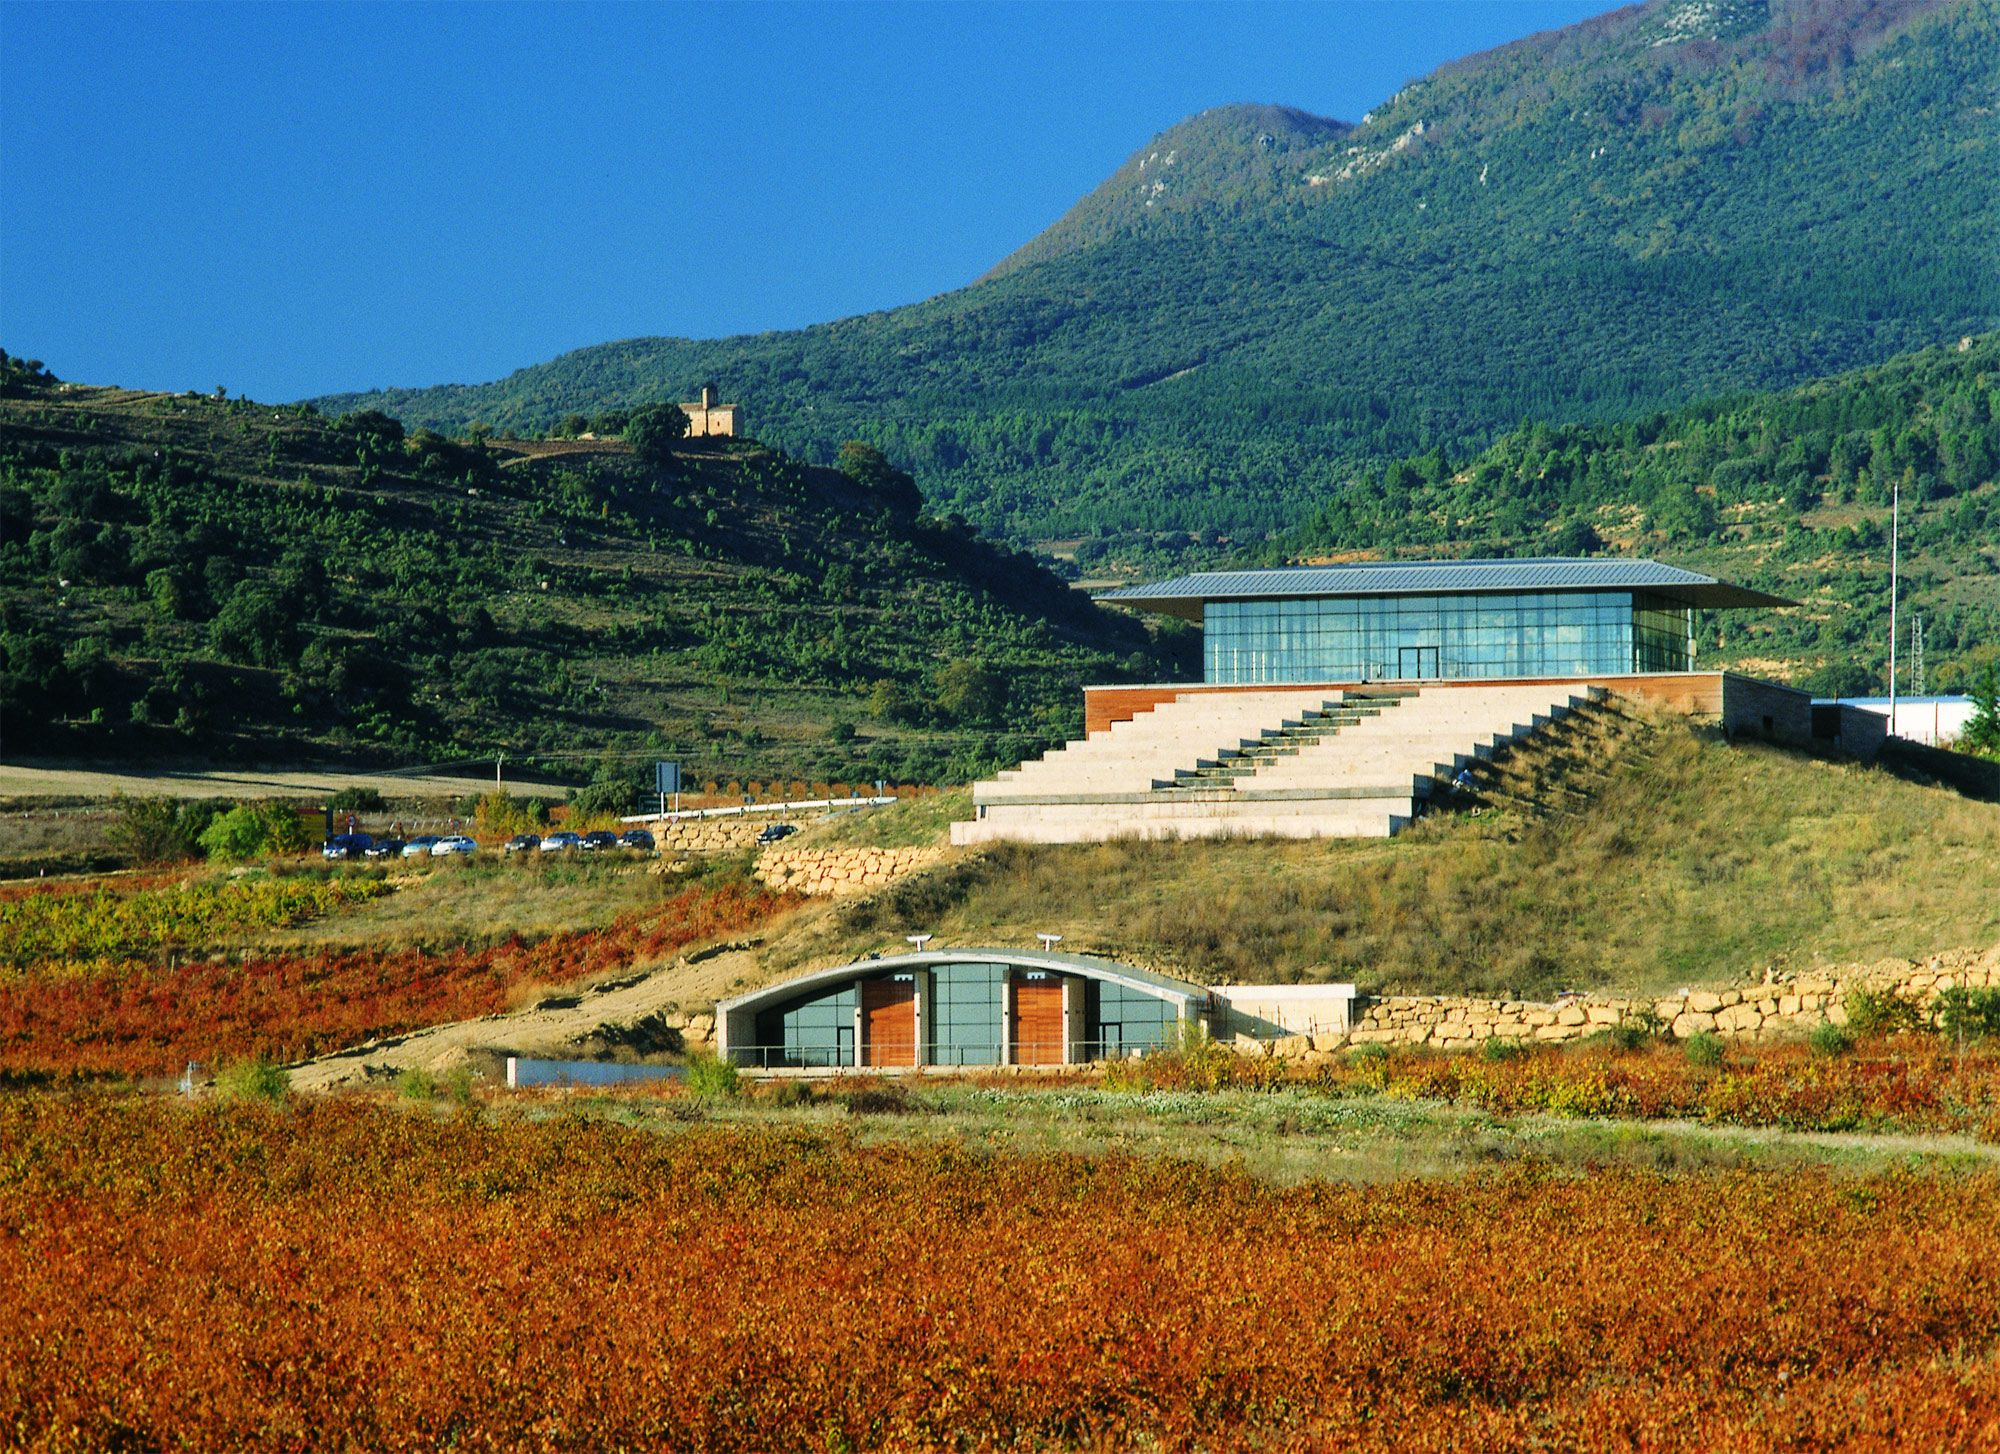 Baigorri wineries